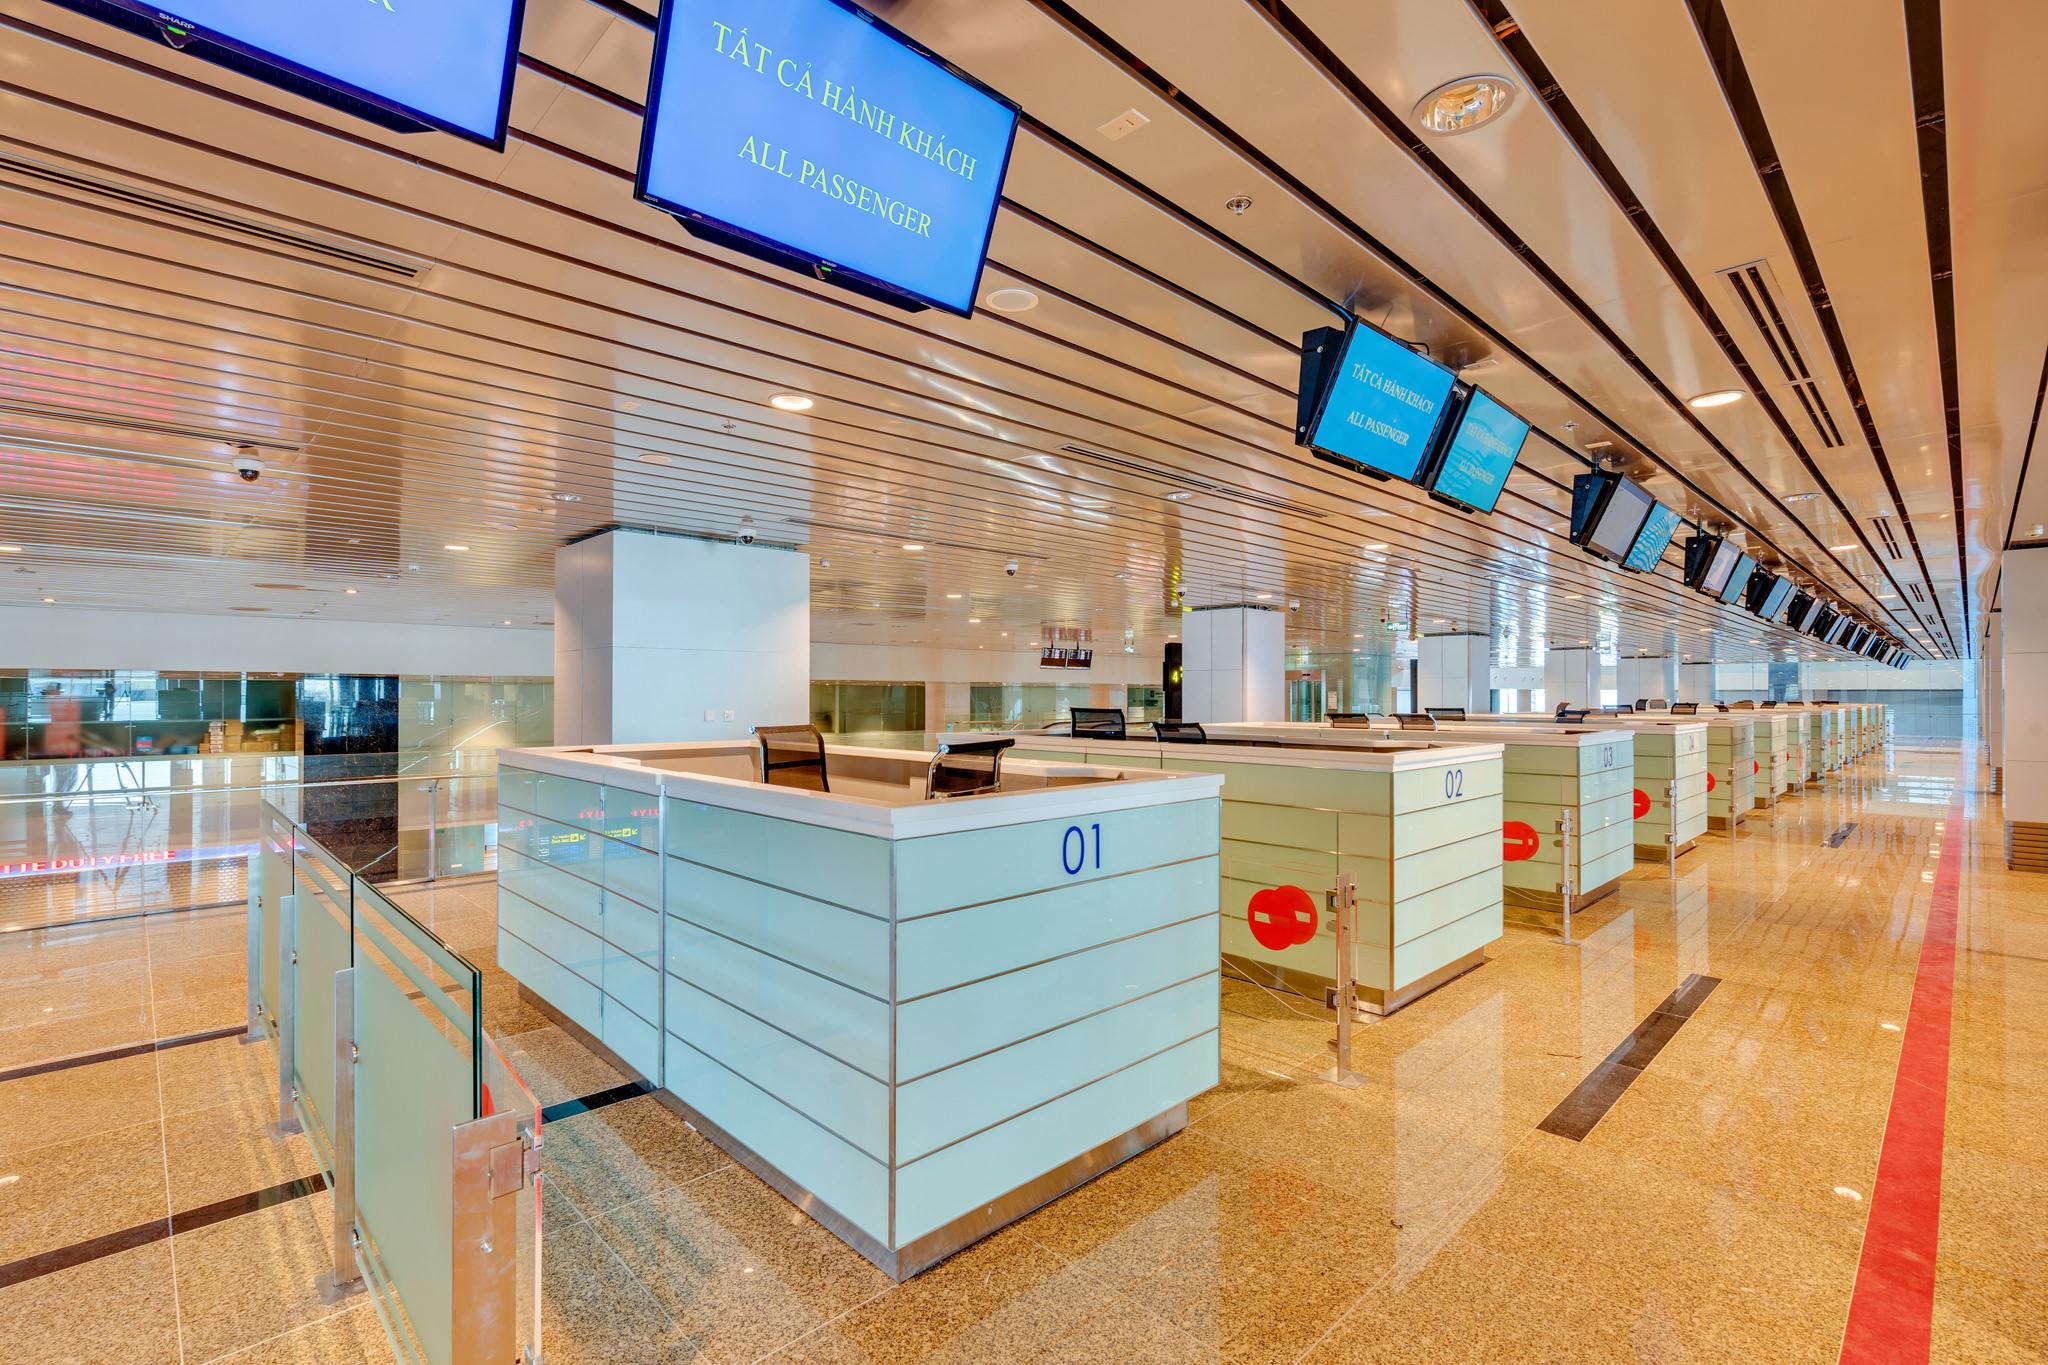 20180626 - Cam Ranh Airport - Architecture - 0152.jpg